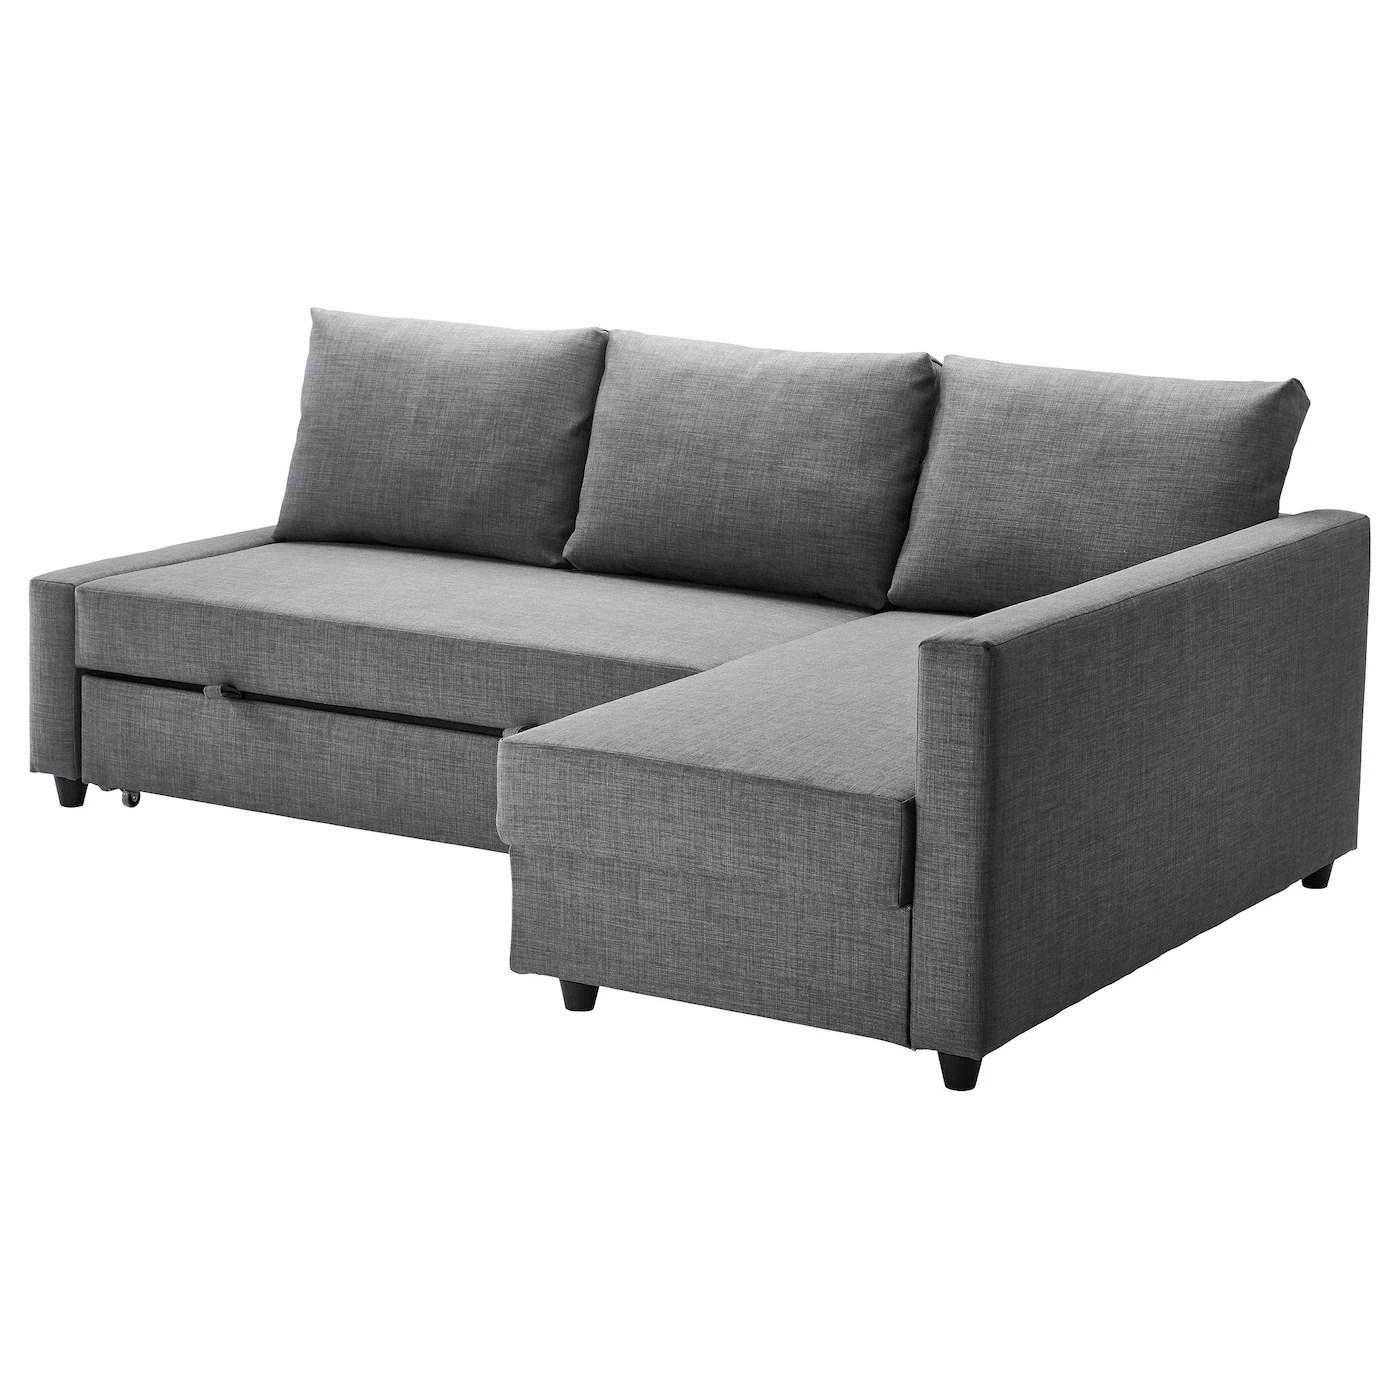 Sleeper Sectional 3 Seat W Storage Friheten Skiftebo Dark Gray